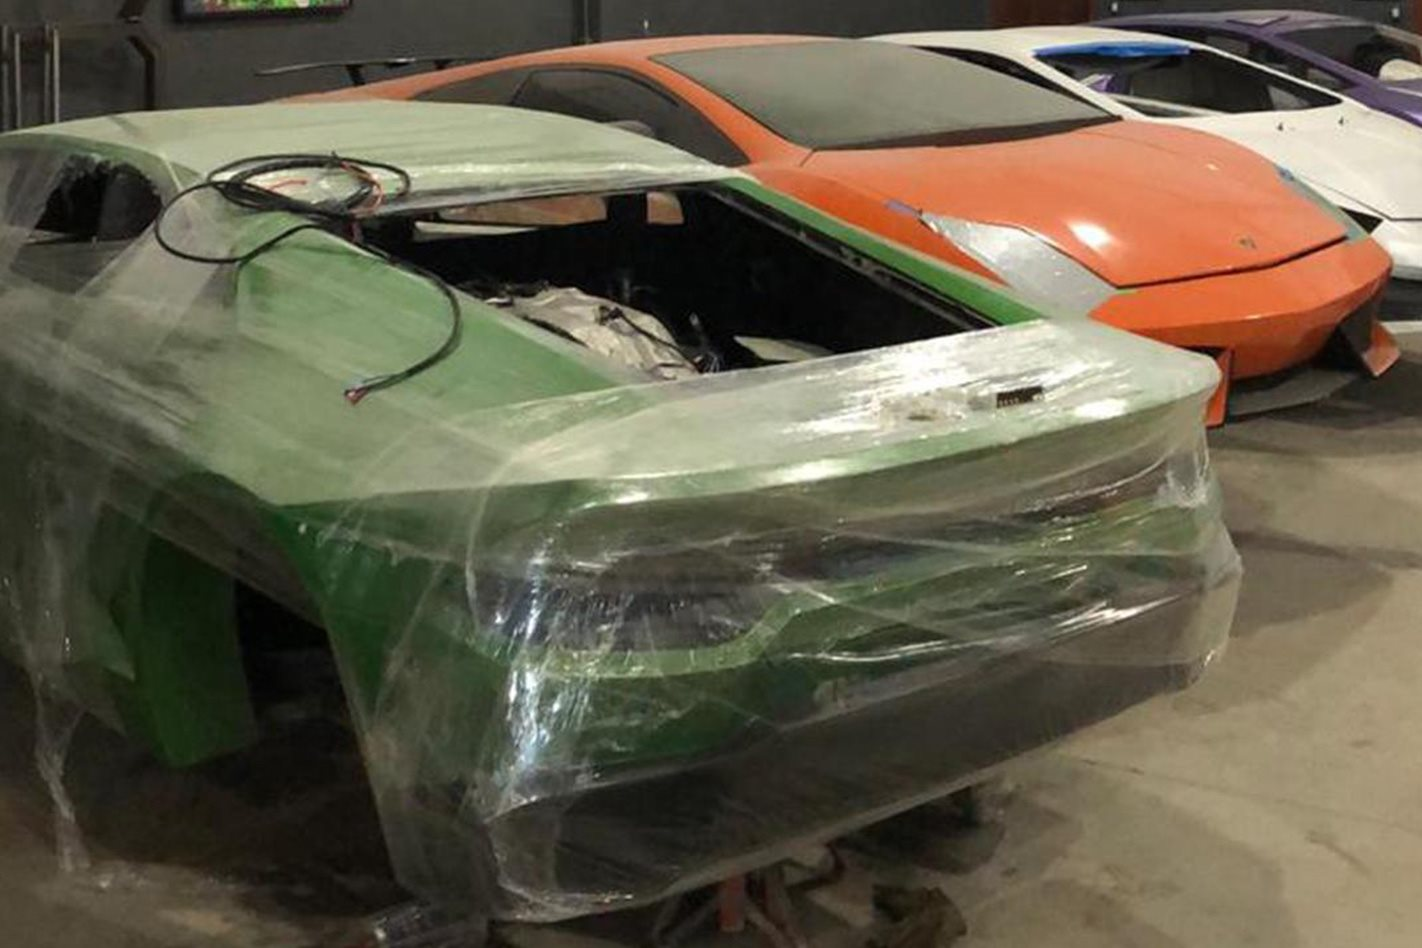 Police seize Commodore V6-powered fake supercars